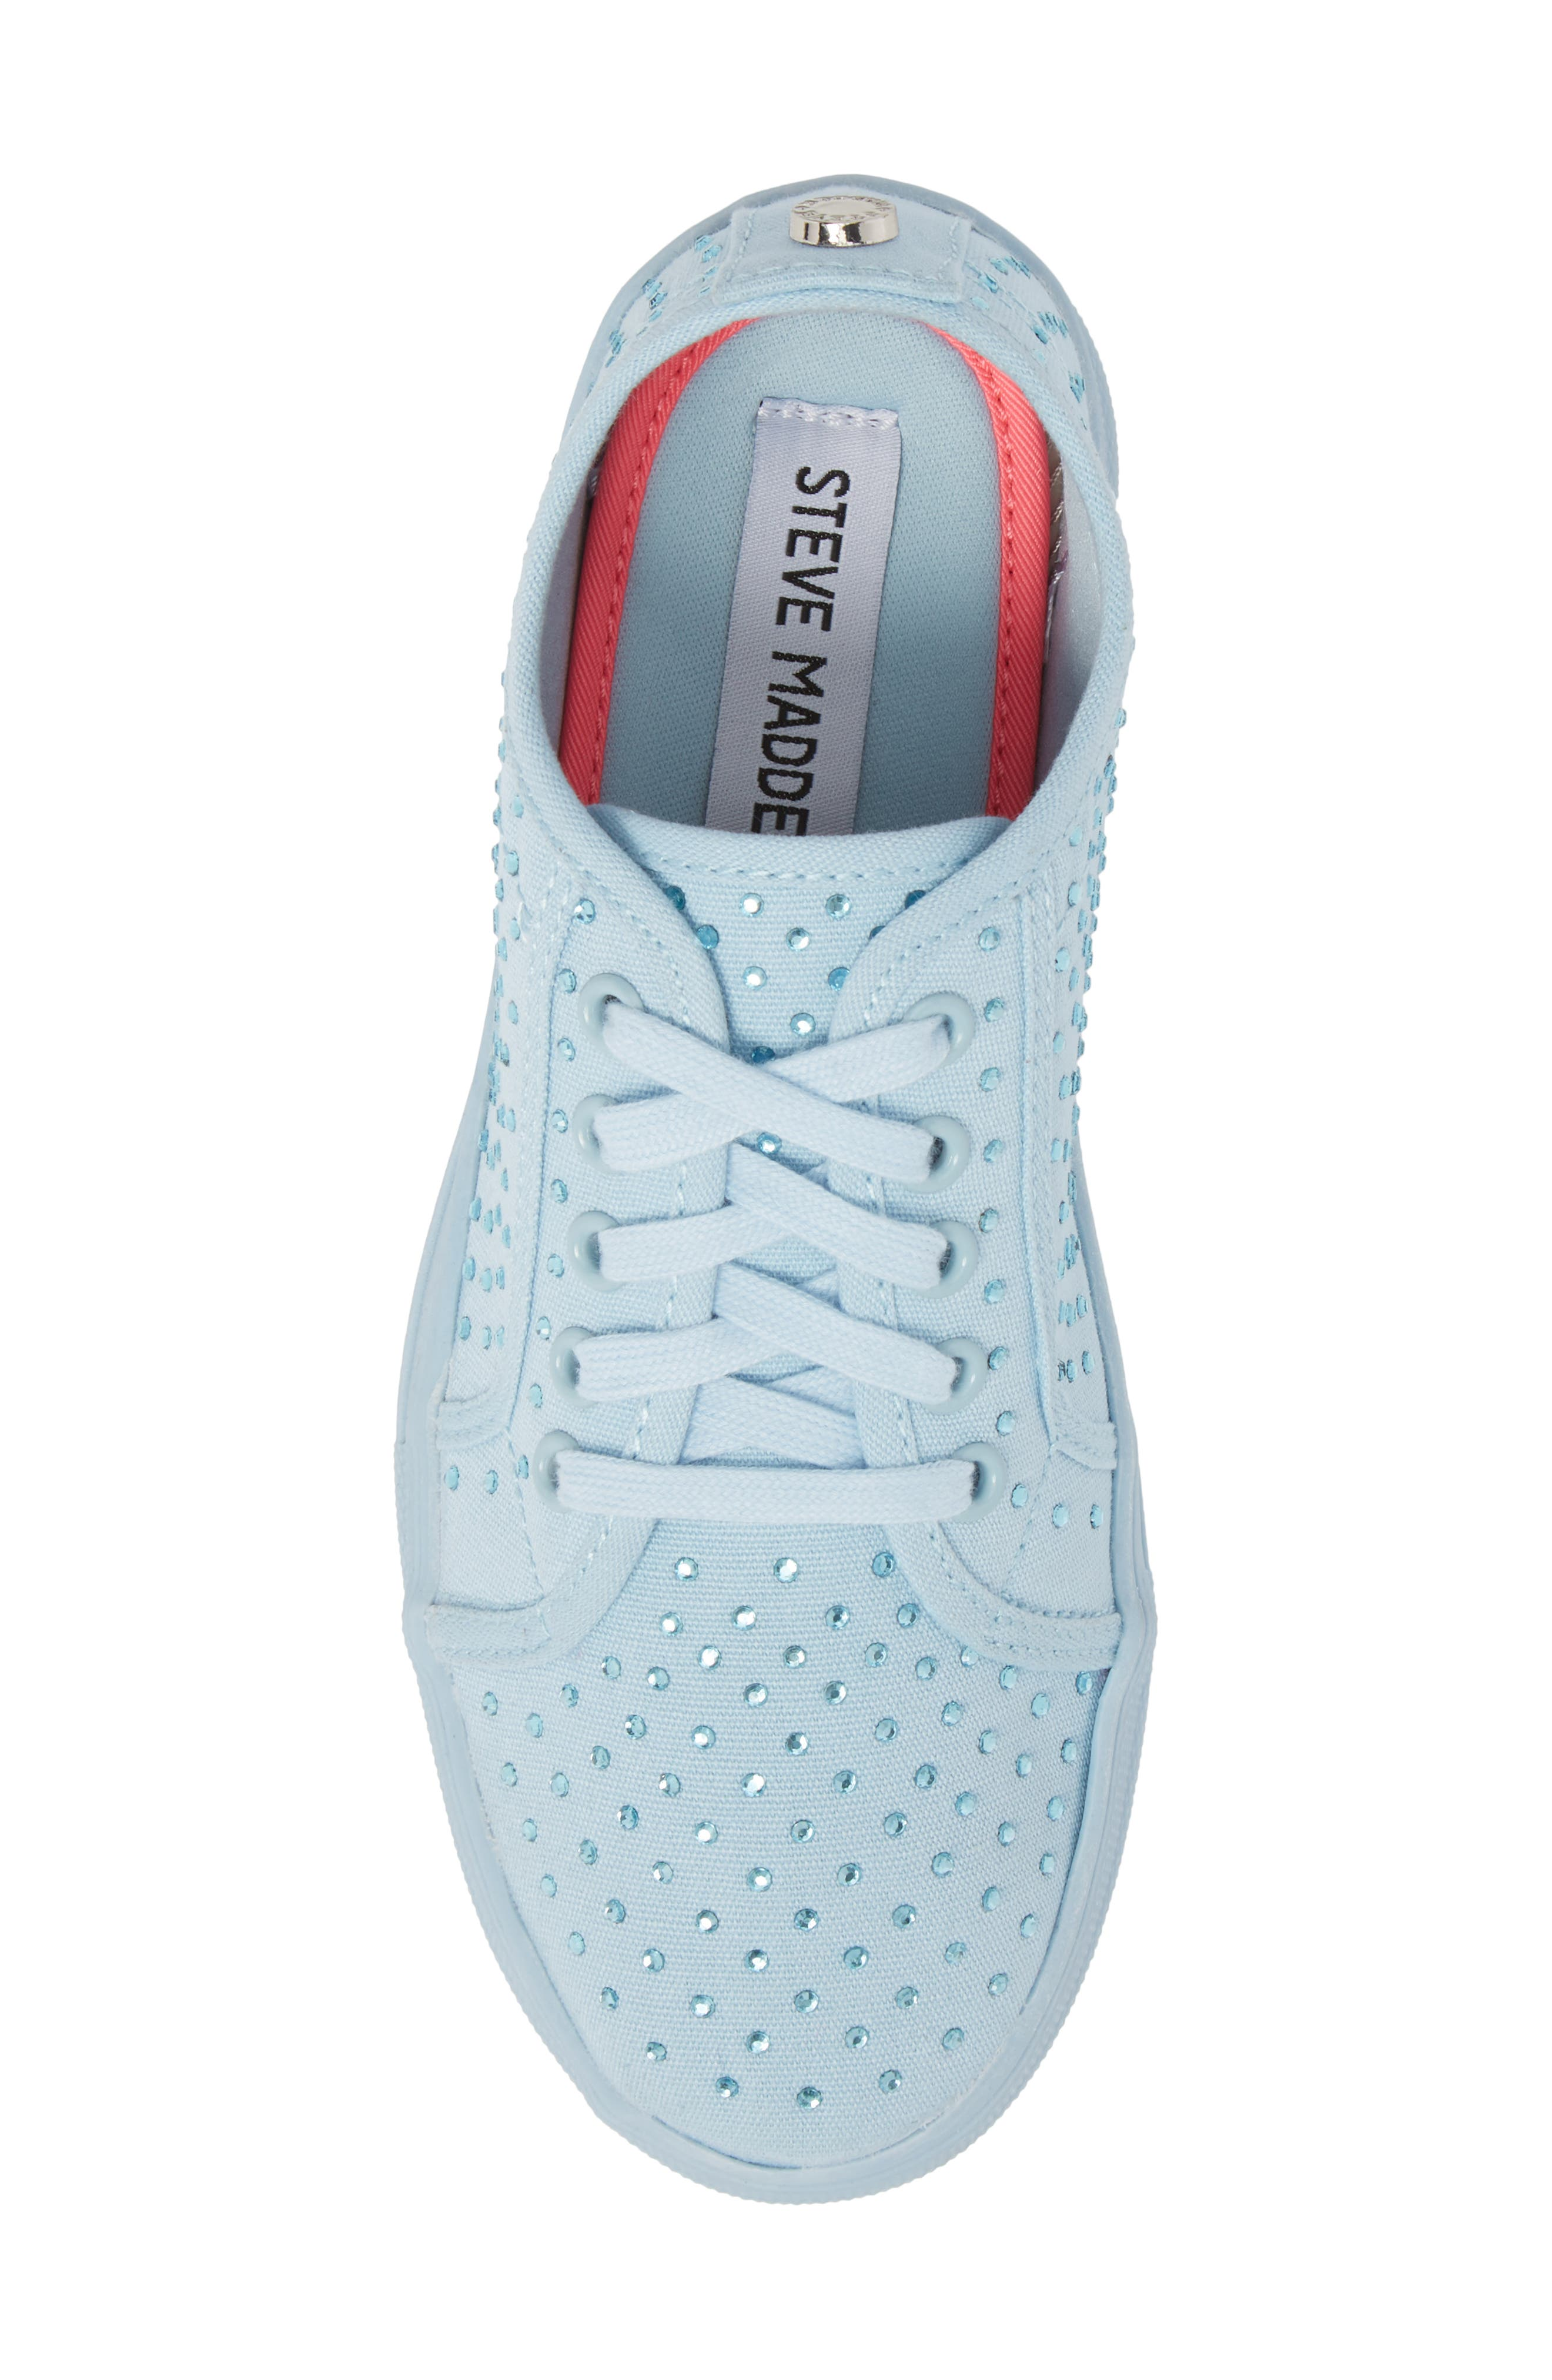 Jmono Sneaker,                             Alternate thumbnail 5, color,                             Blue